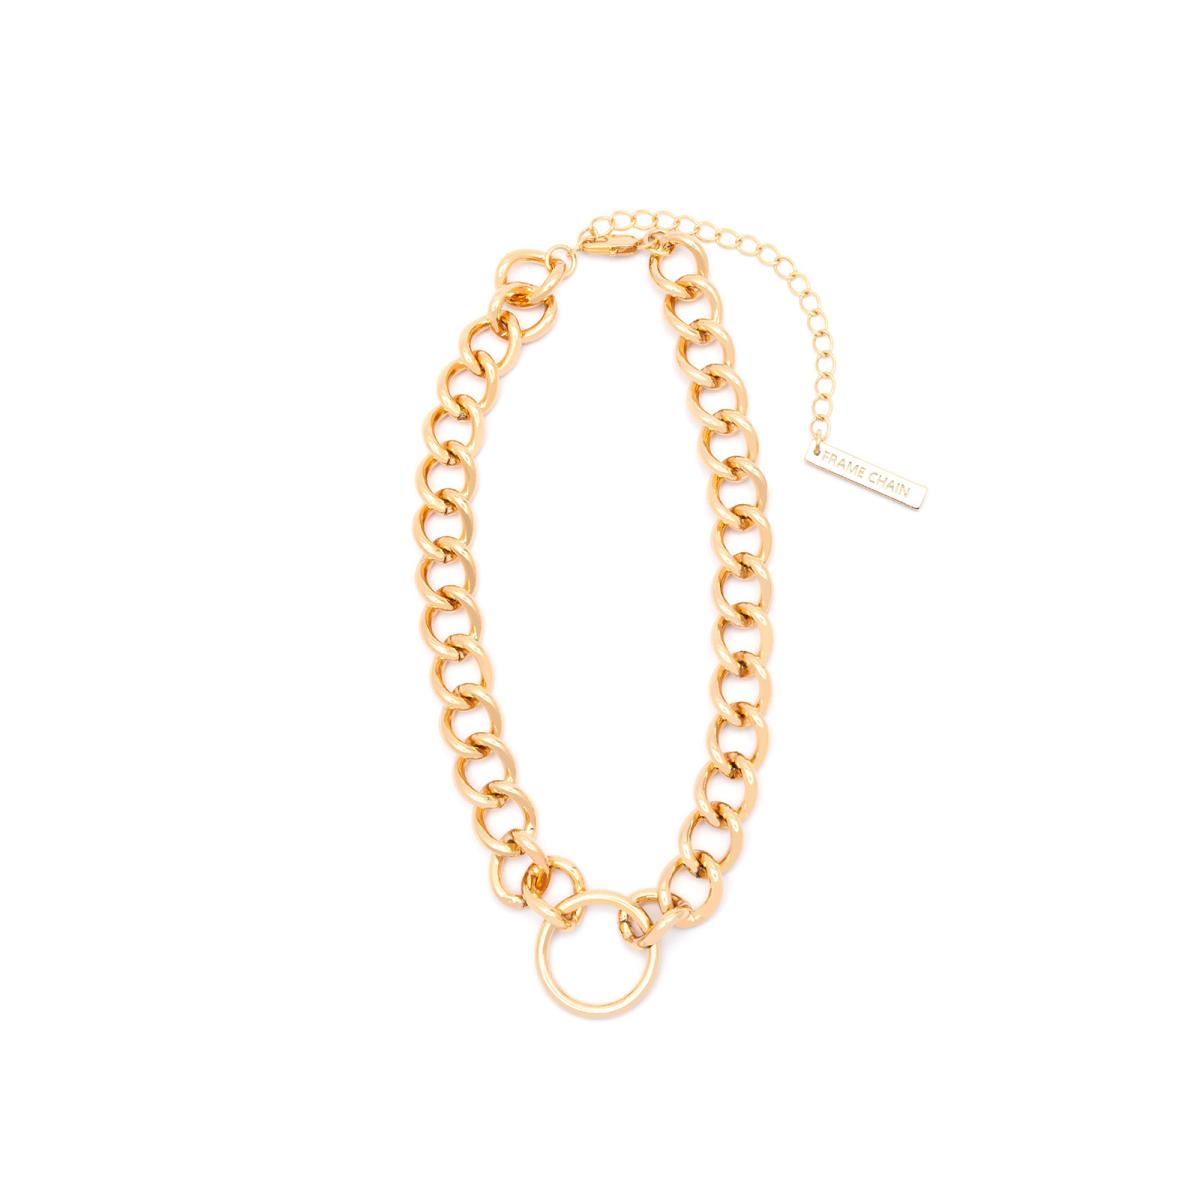 Frame Chain HOOKER DIAMOND YELLOW GOLD  (1)